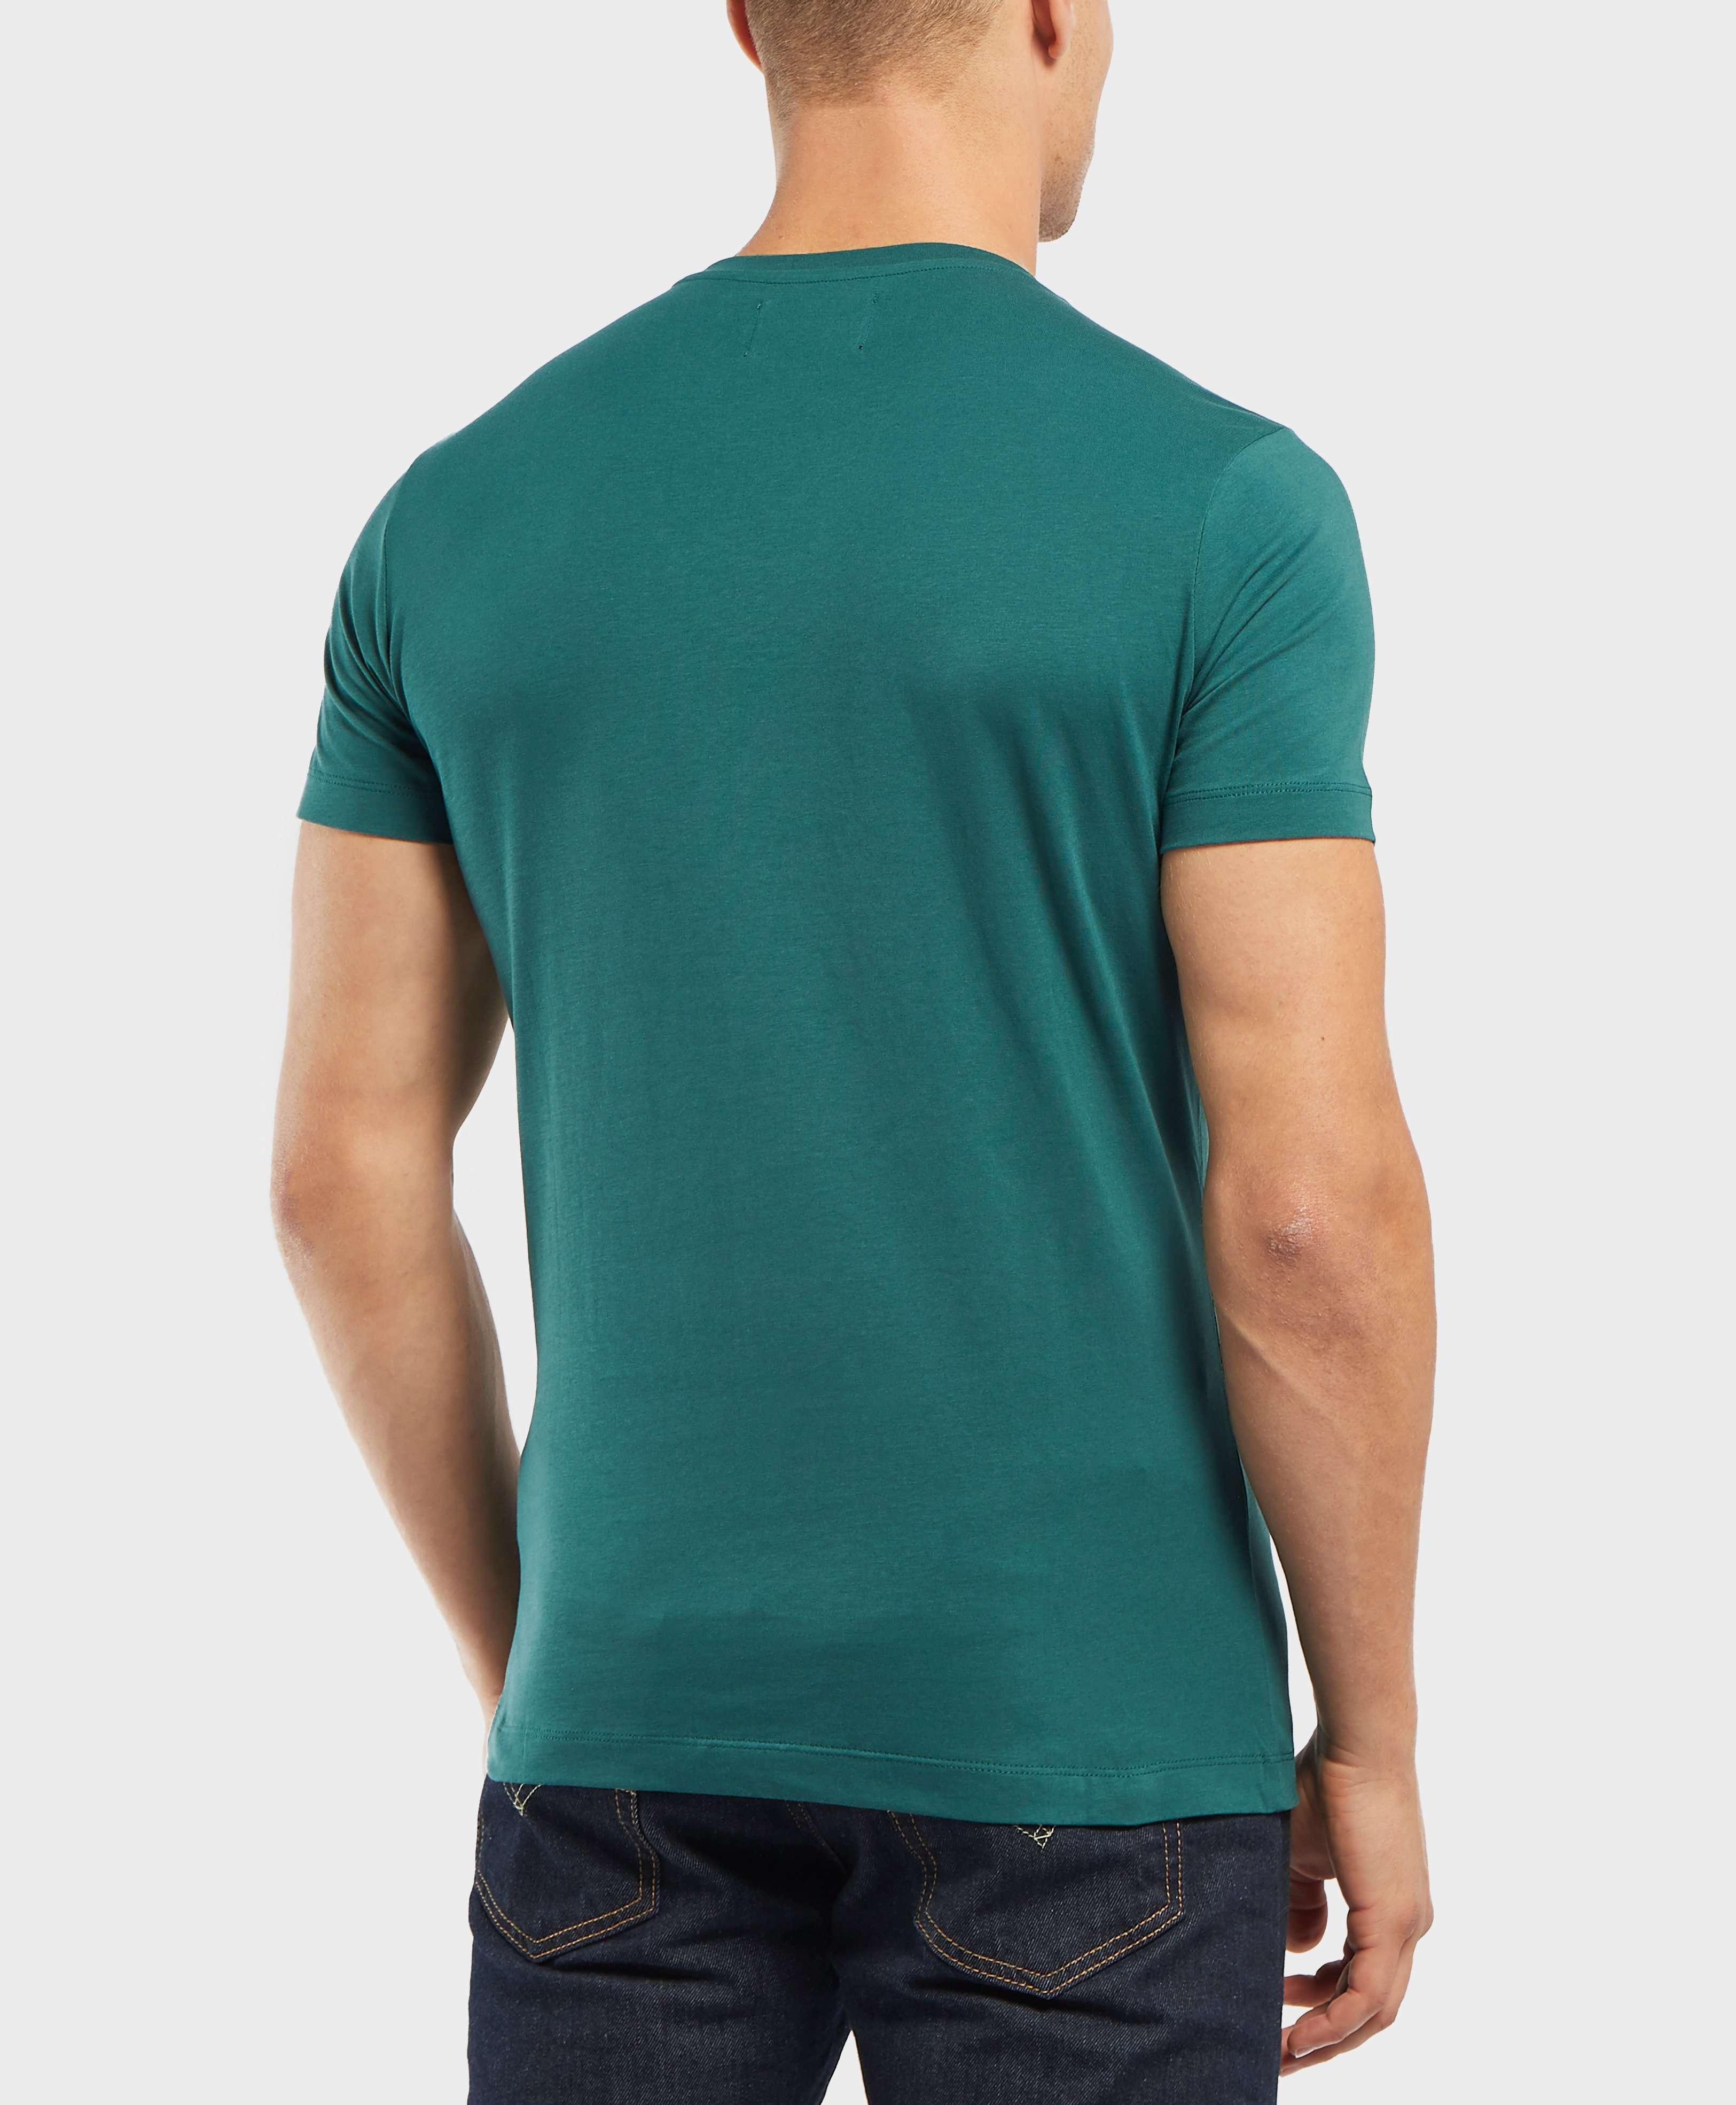 Calvin Klein Monogram Box Short Sleeve T-Shirt